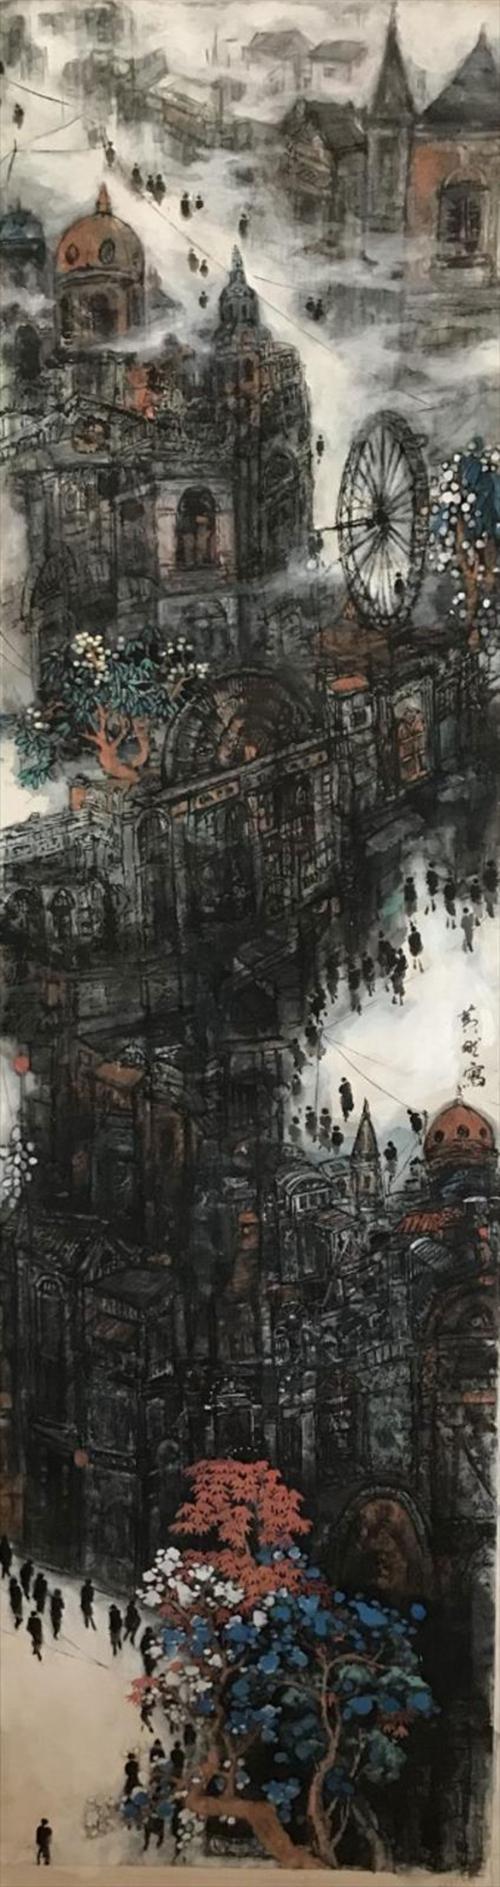 Huang-Yellon-Ran-Beyond-the-Trees-1.jpg